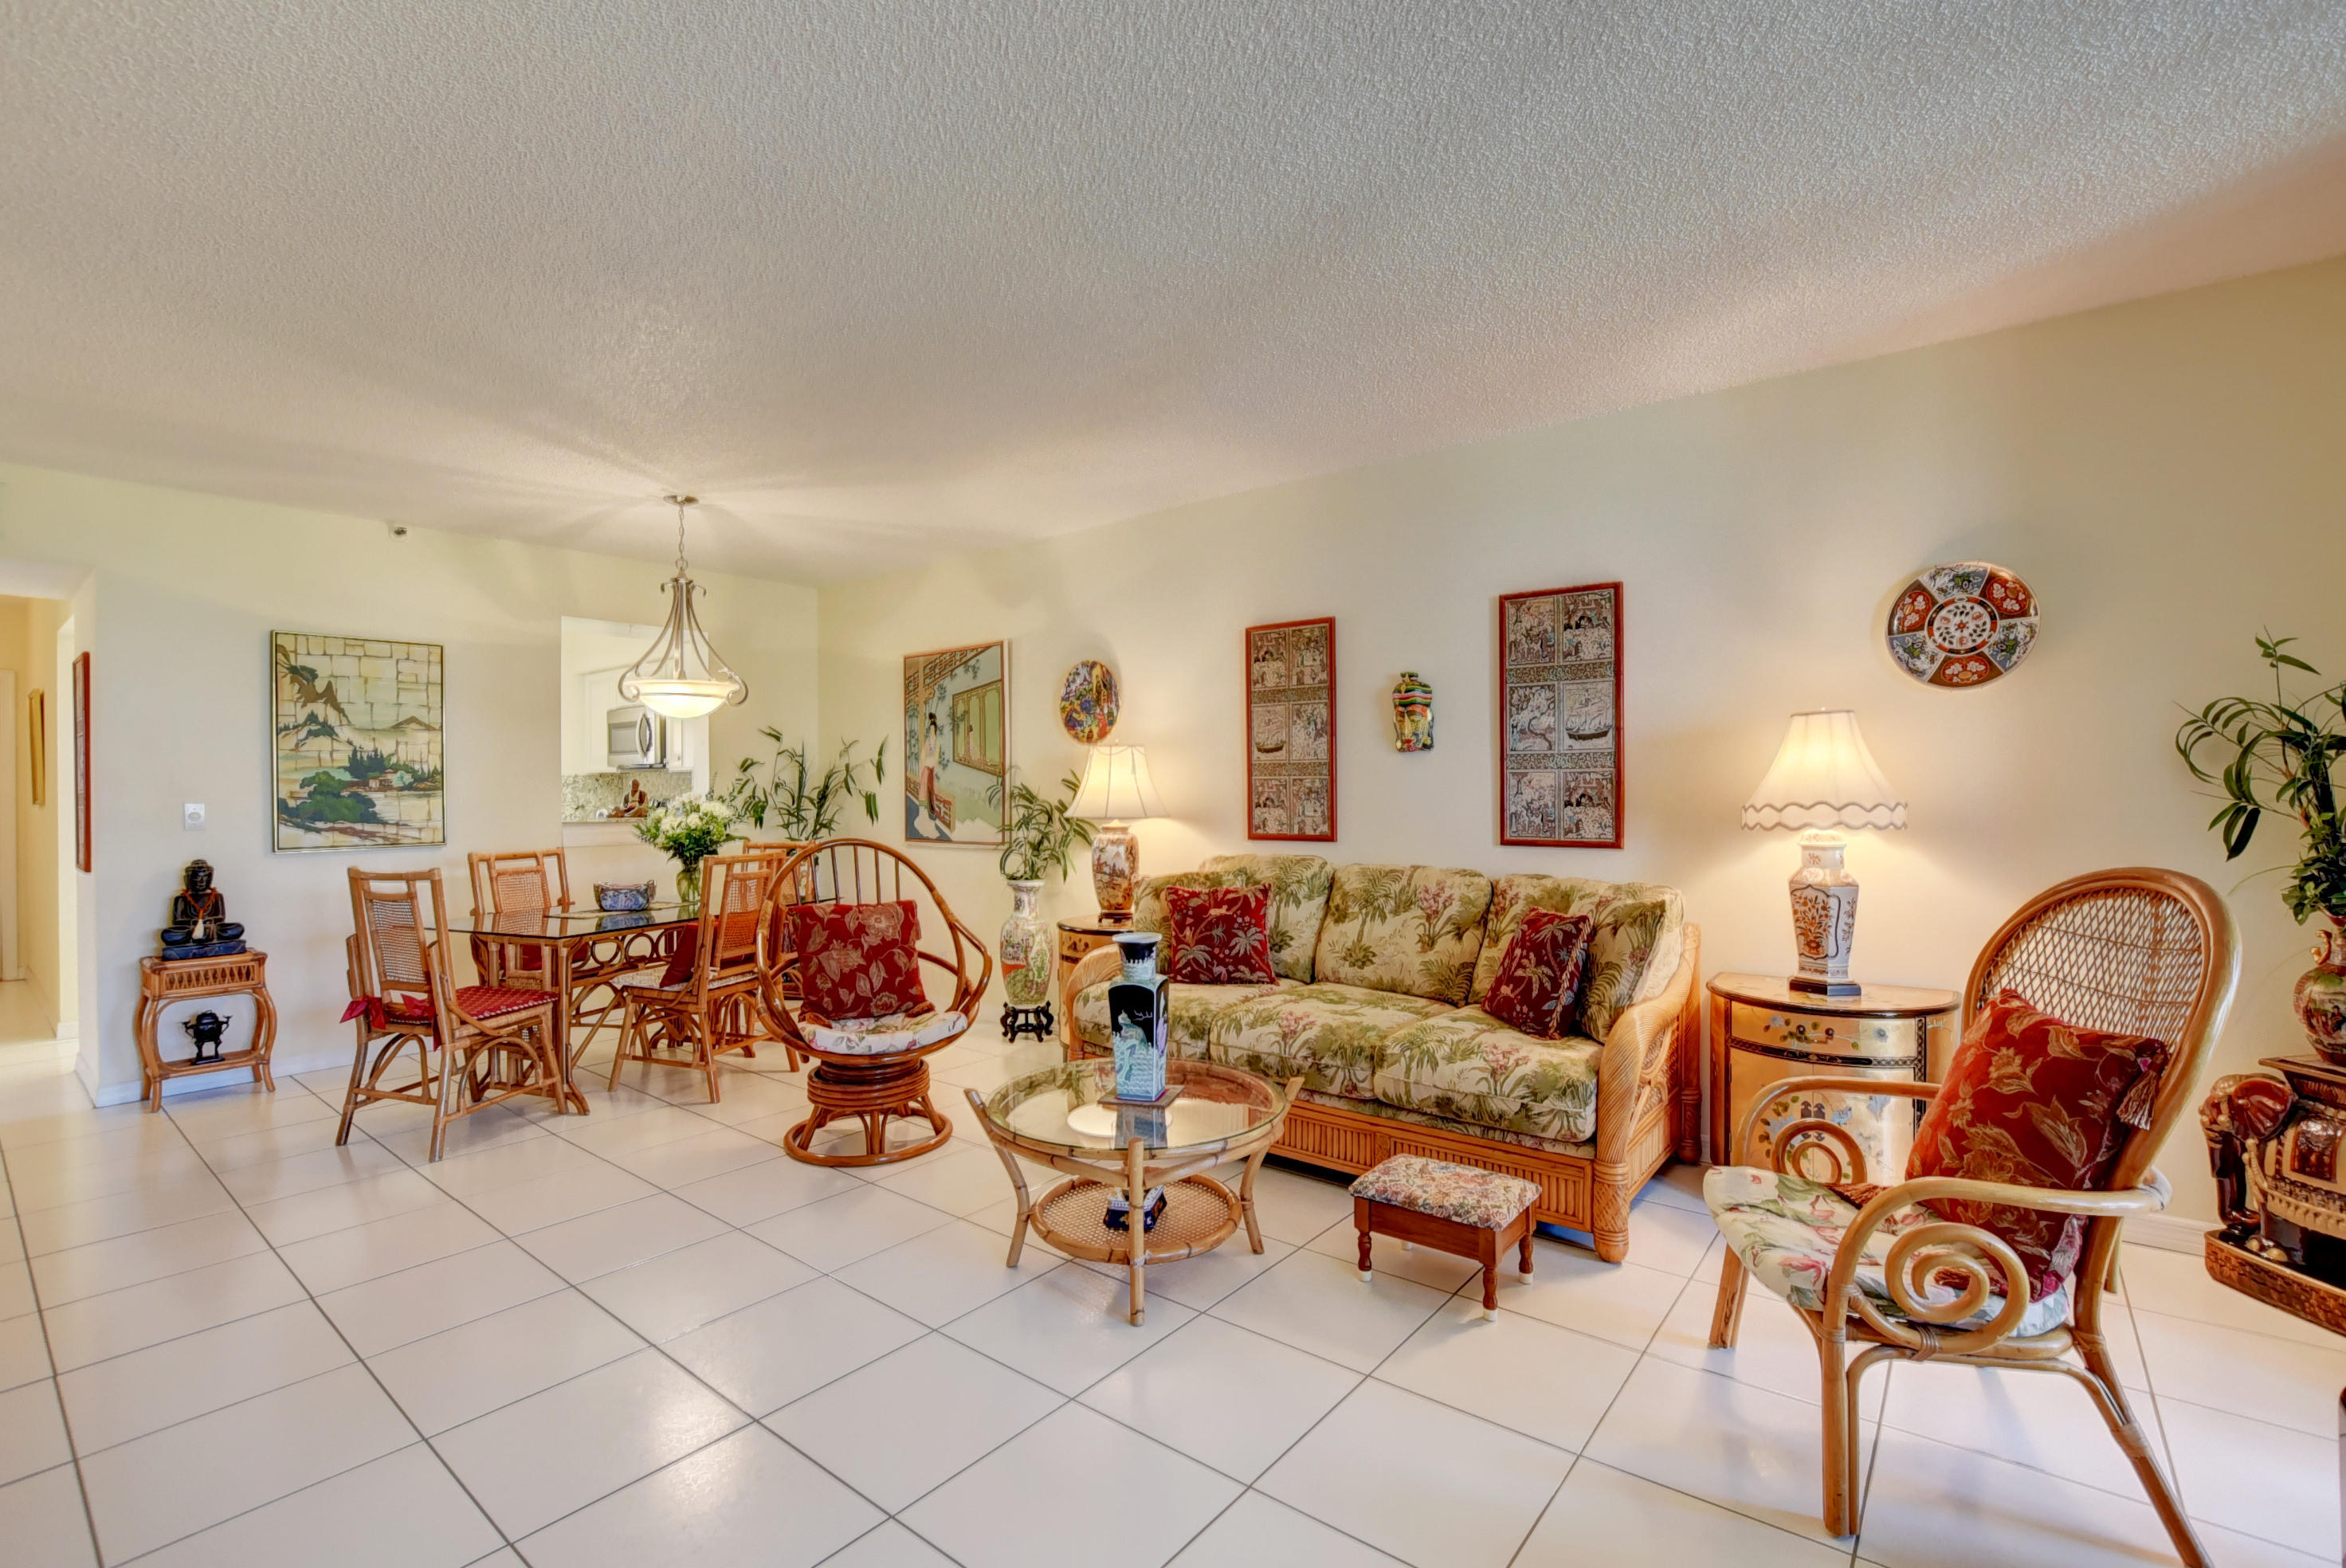 14527 Bonaire Boulevard #510 - 33446 - FL - Delray Beach